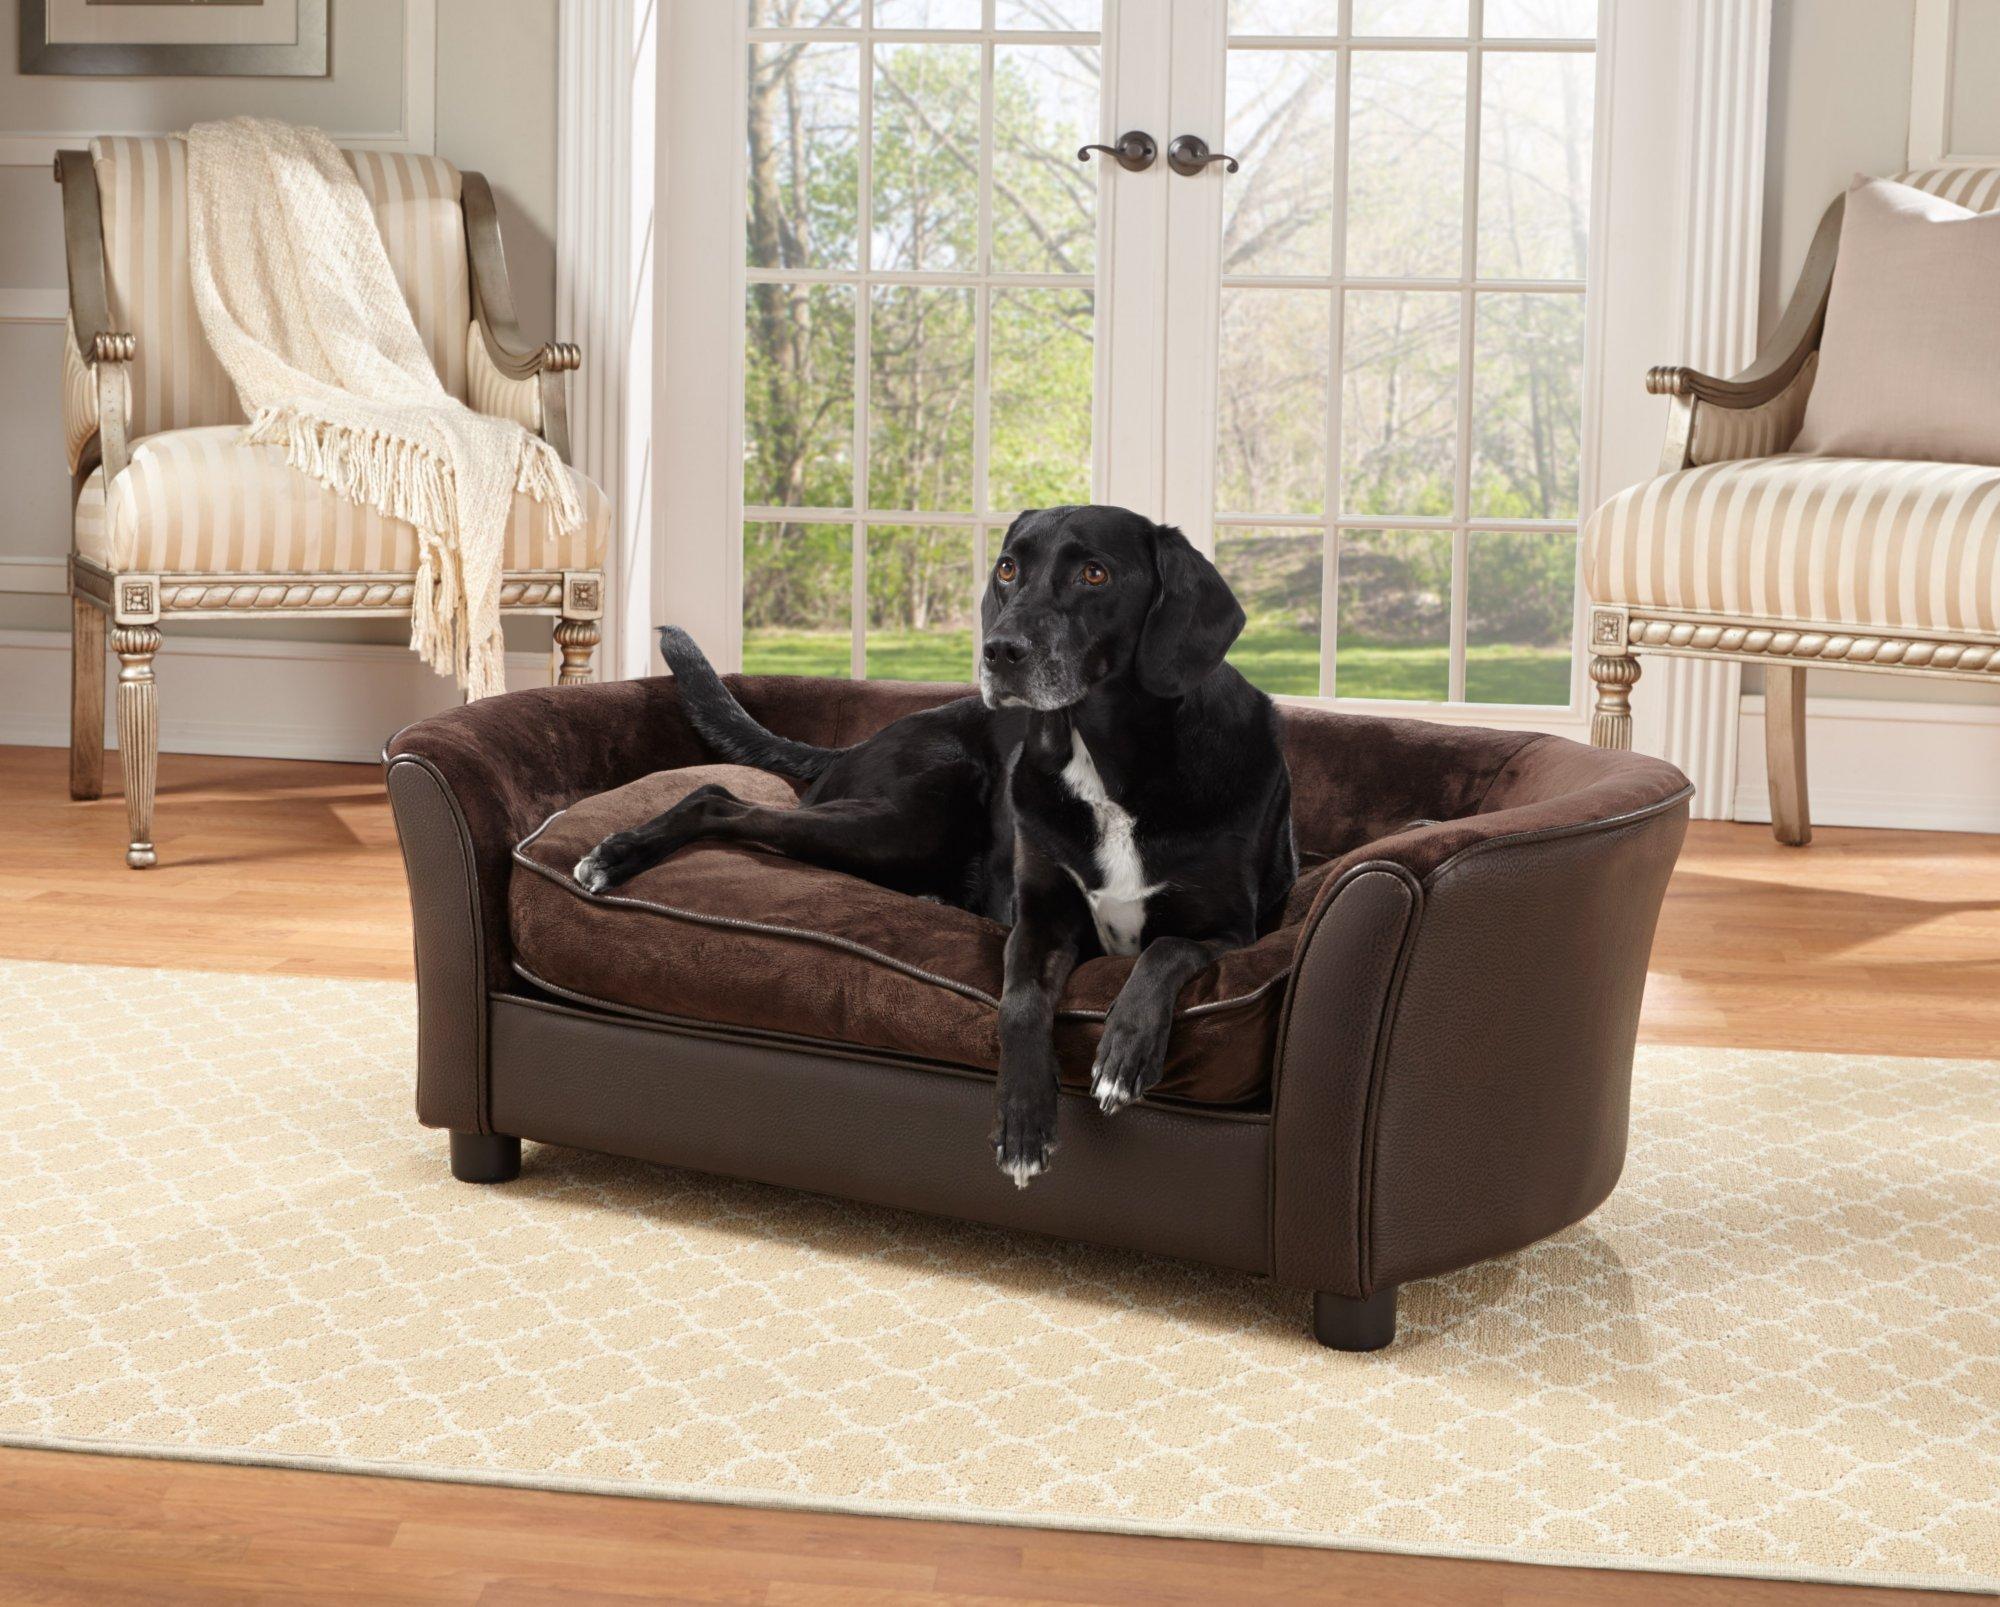 Dog Couches Dog Furniture Luxury Dog Beds Sofas Petco